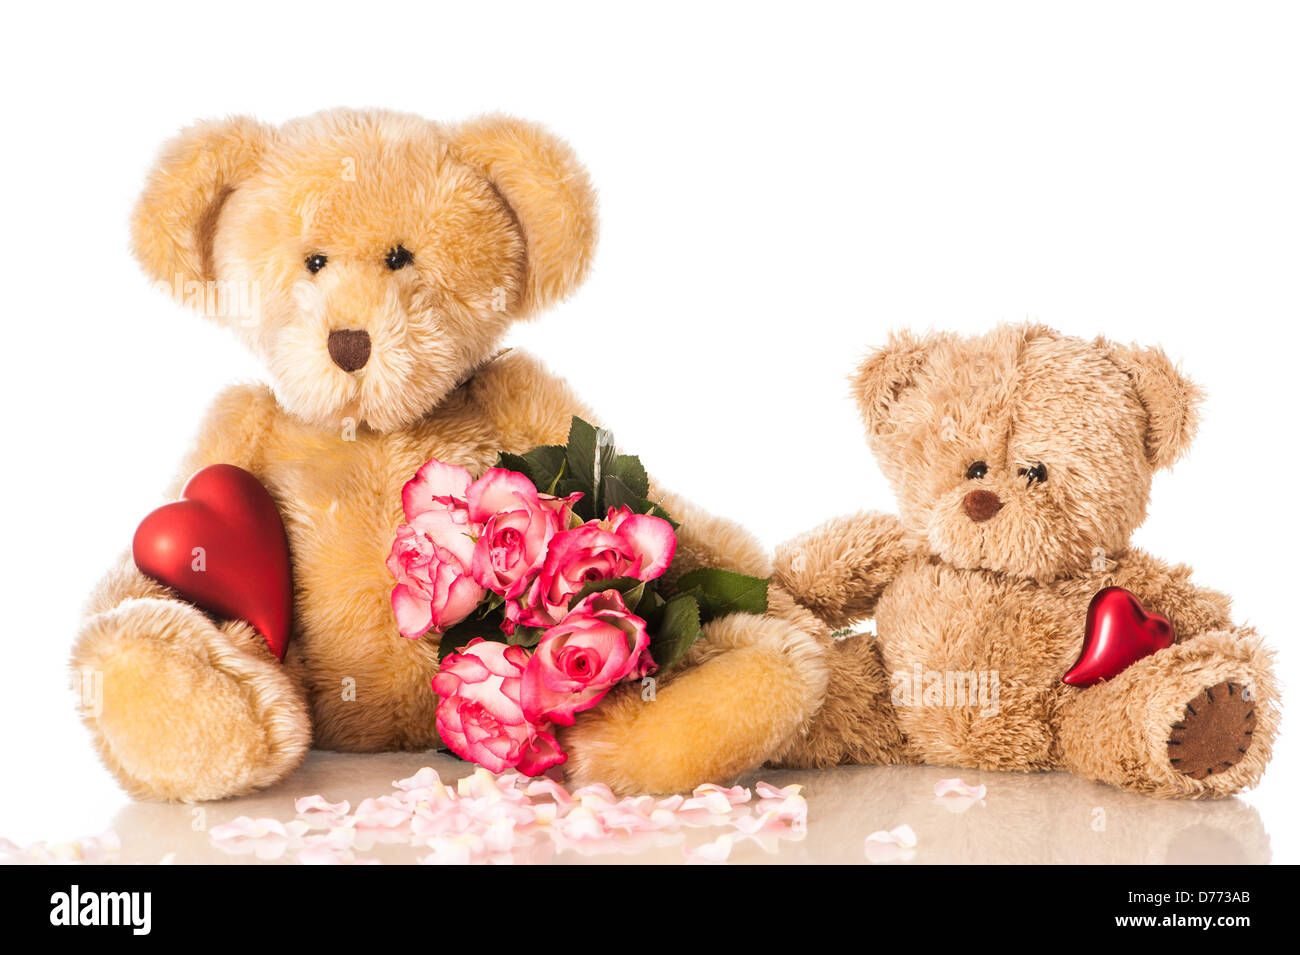 Teddy Bear Red Rose Stockfotos & Teddy Bear Red Rose Bilder - Seite ...